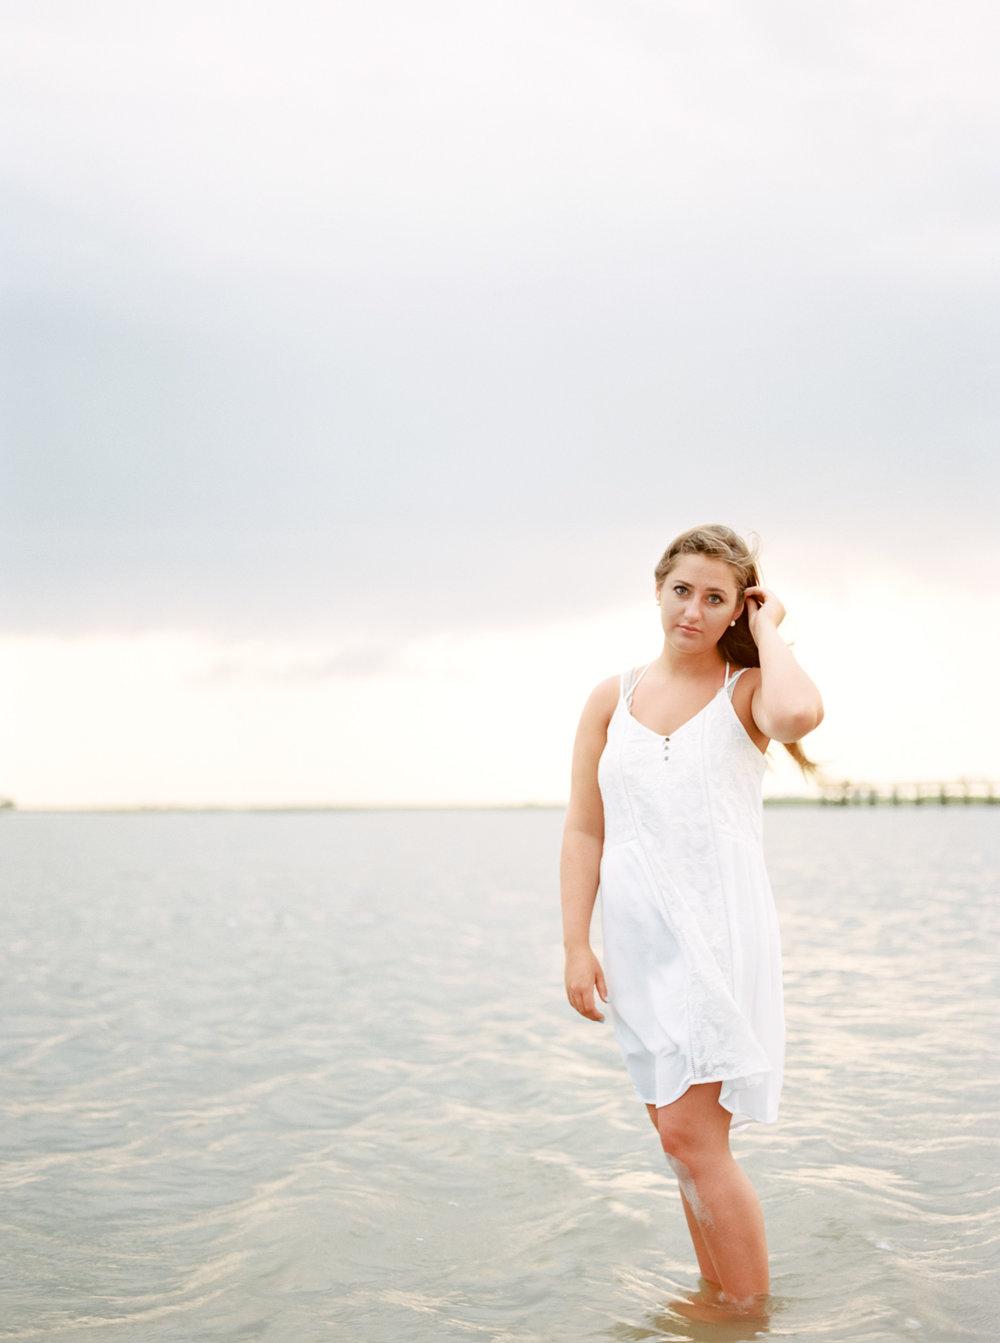 Family beach photos on film by Cleveland Wedding Photographer Matt Erickson Photography